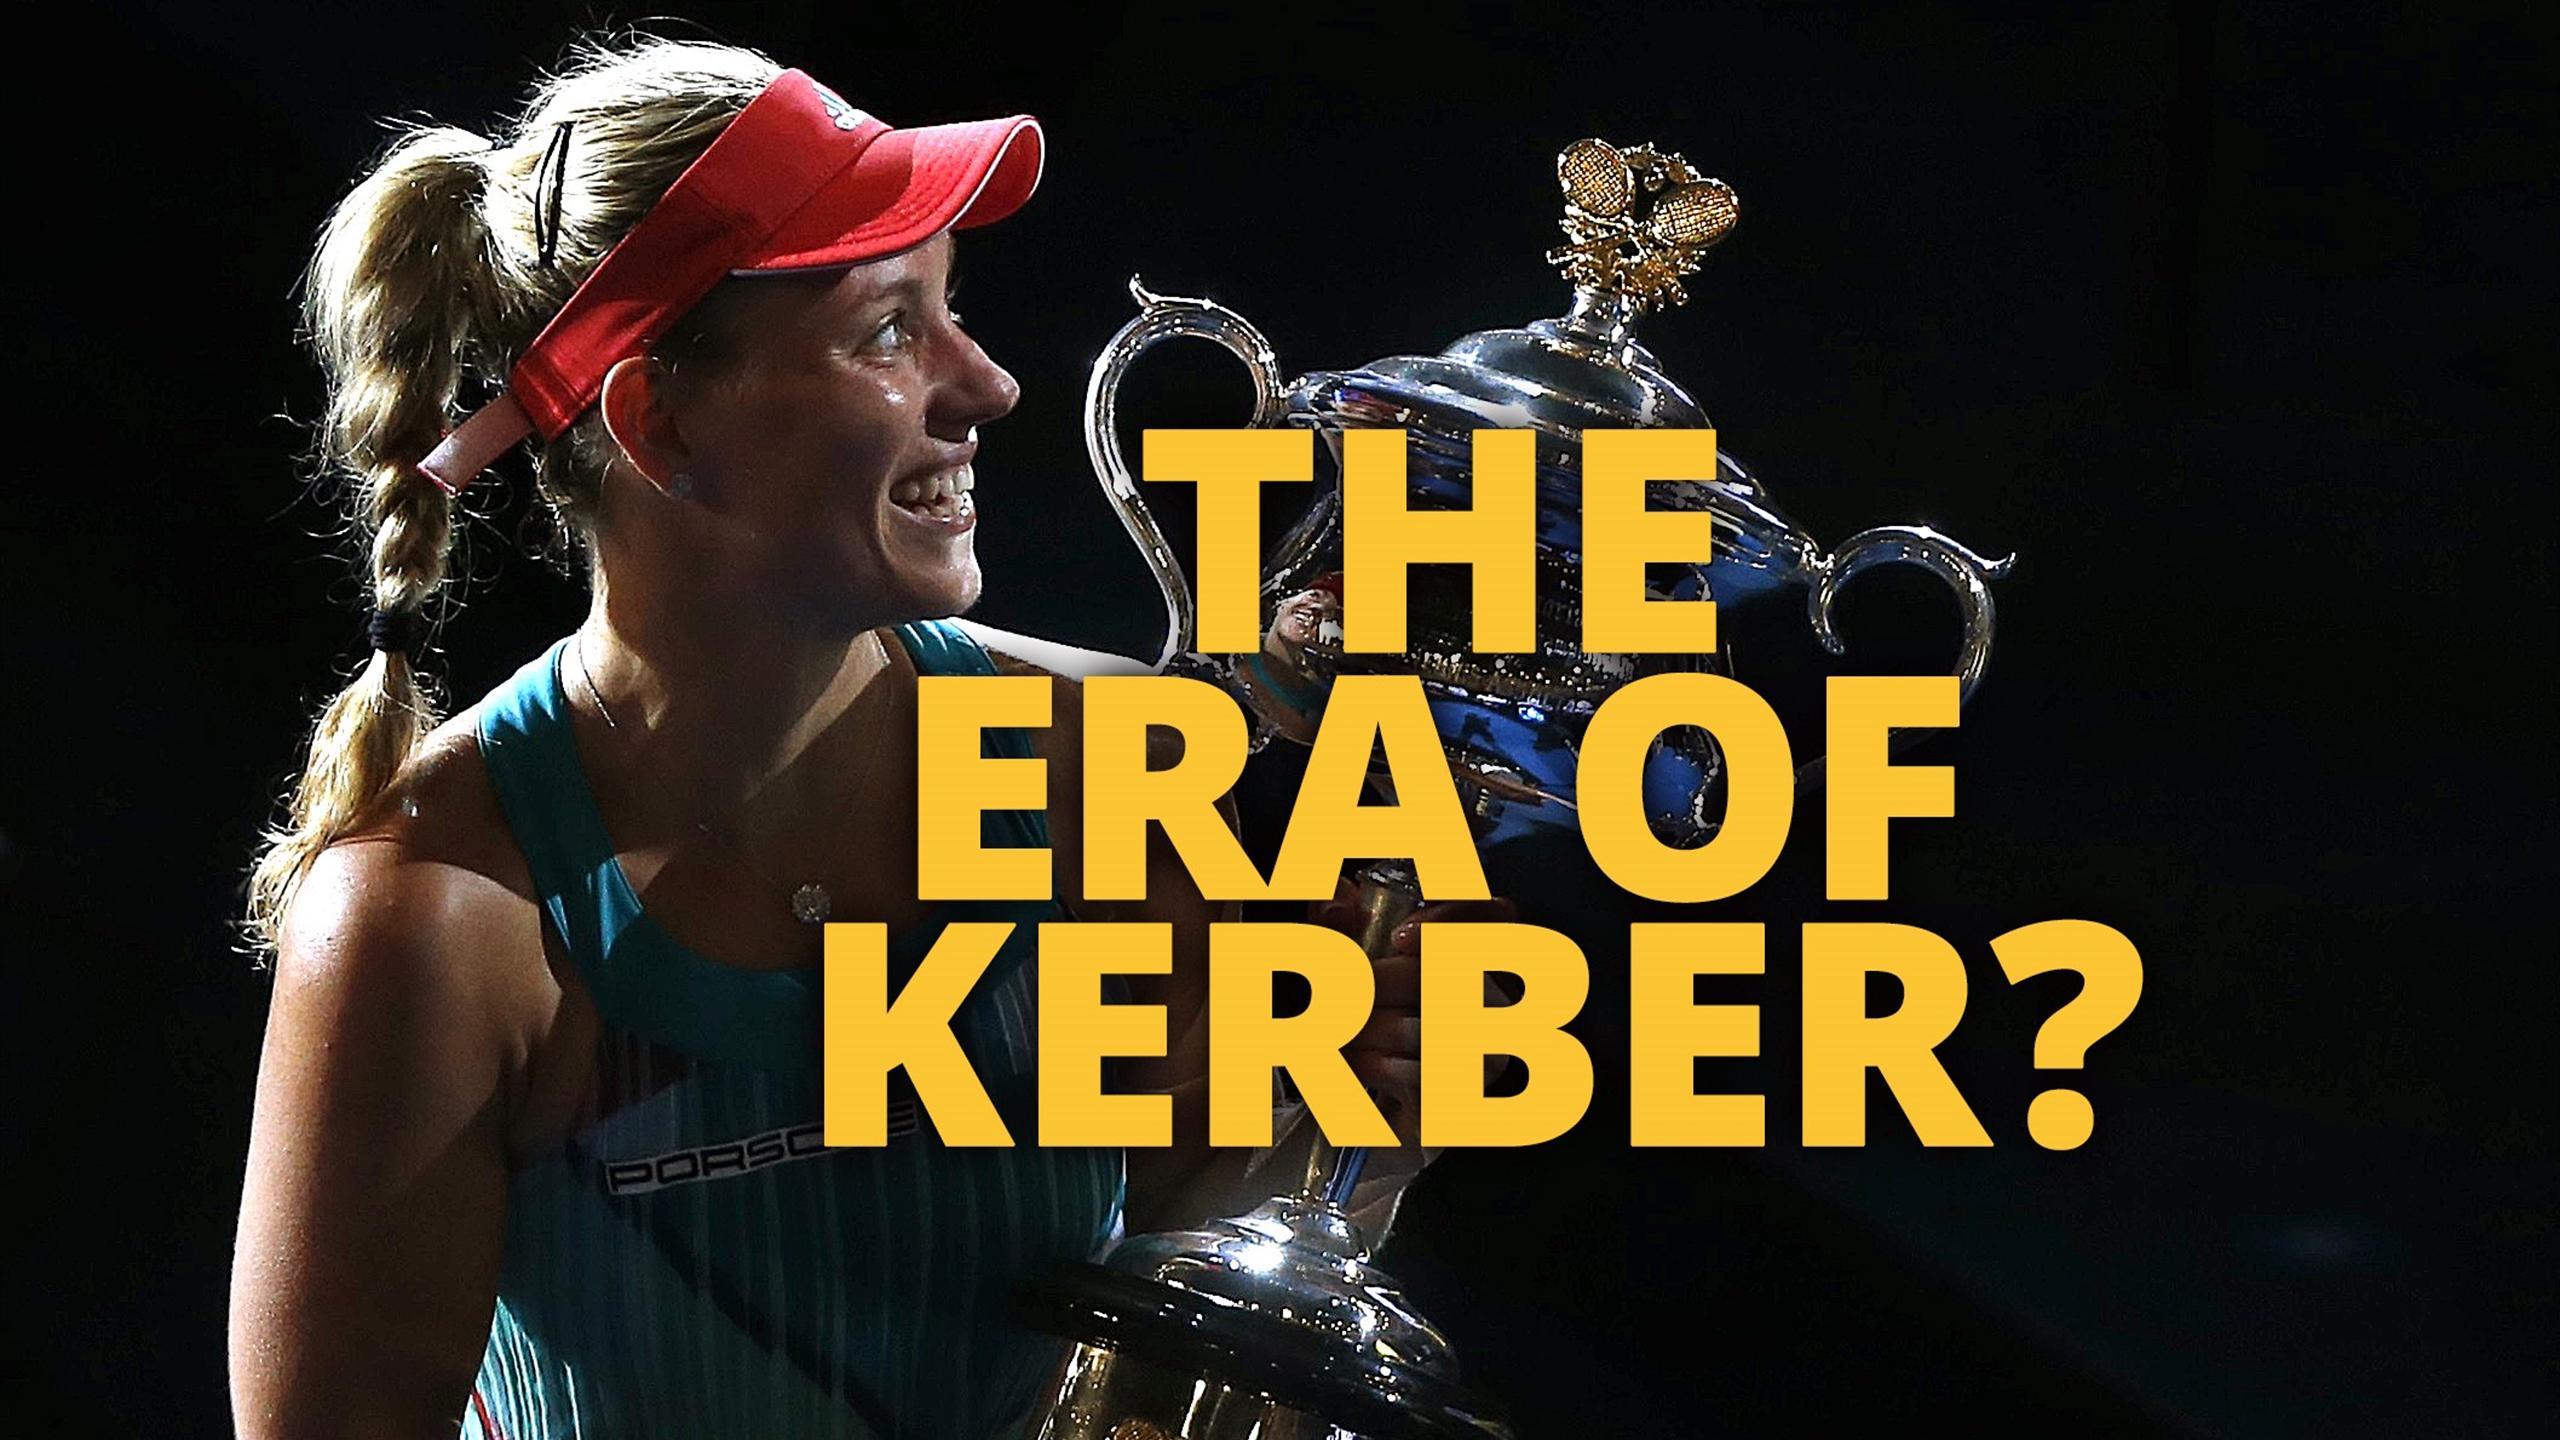 Angelique Kerber - a new era of supremacy?